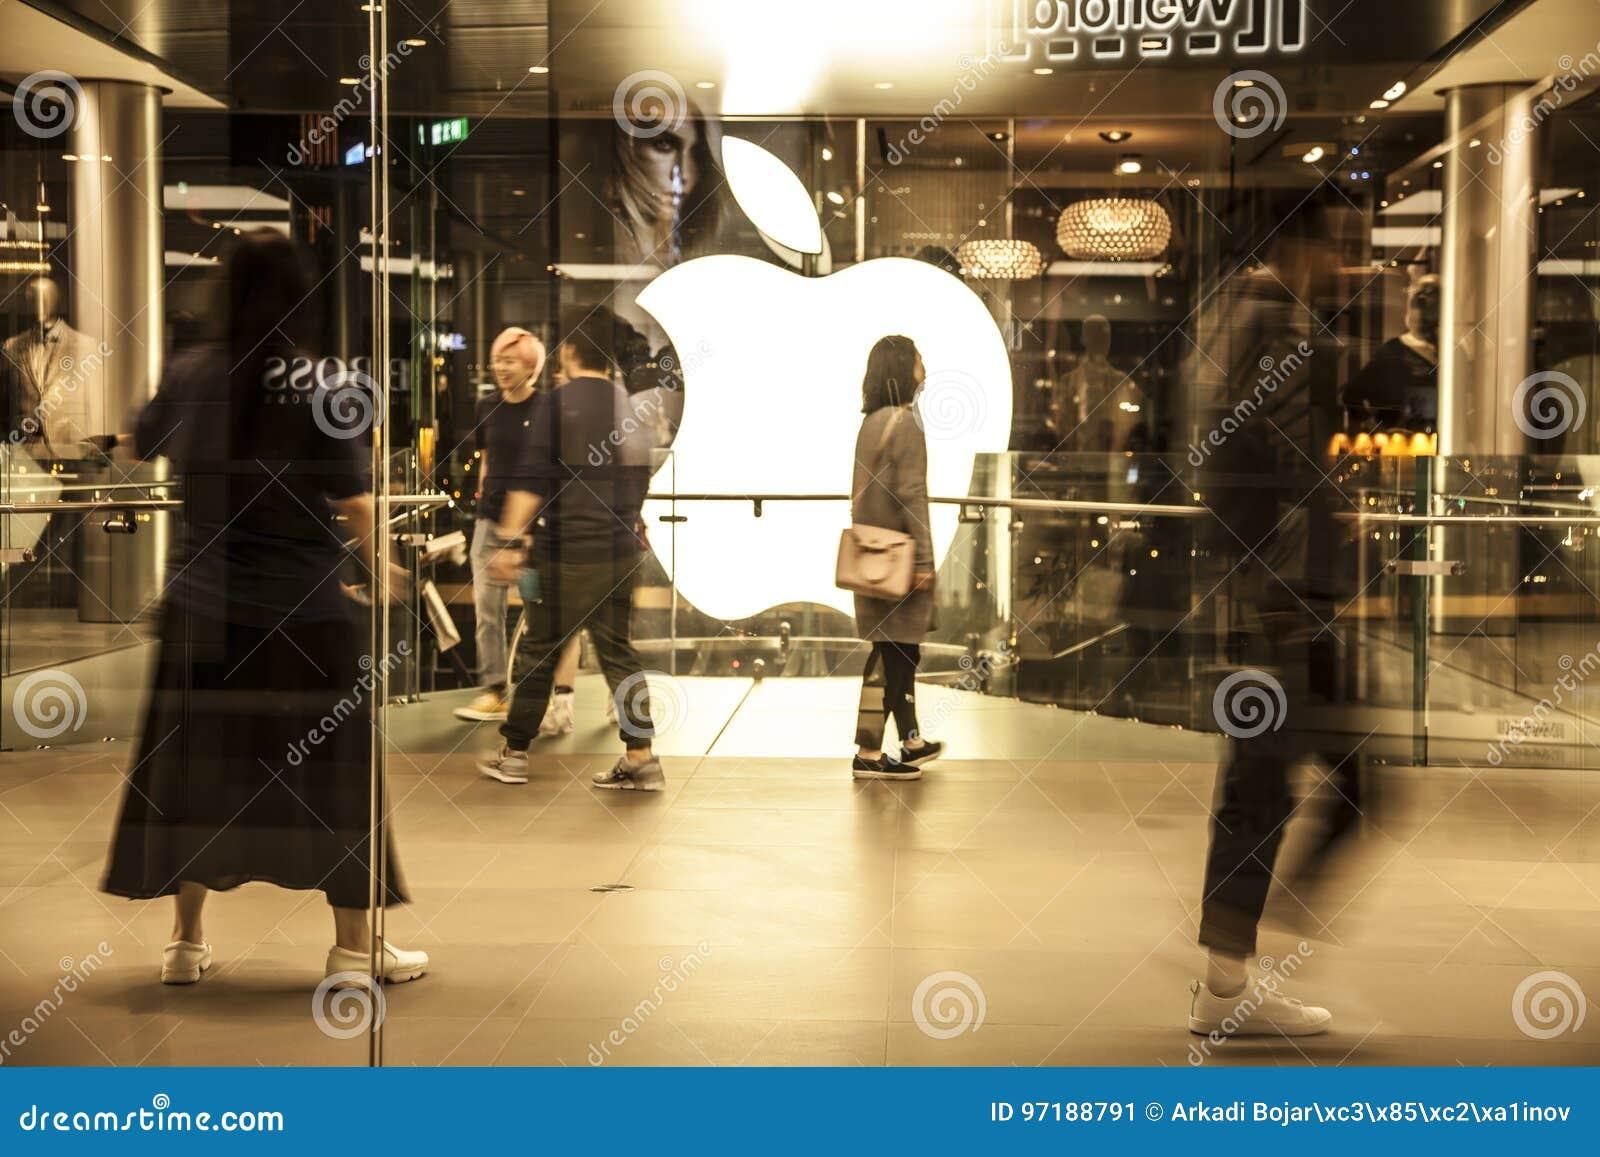 Apple Store και πελάτες στη λεωφόρο αγορών IFC, Χογκ Κογκ